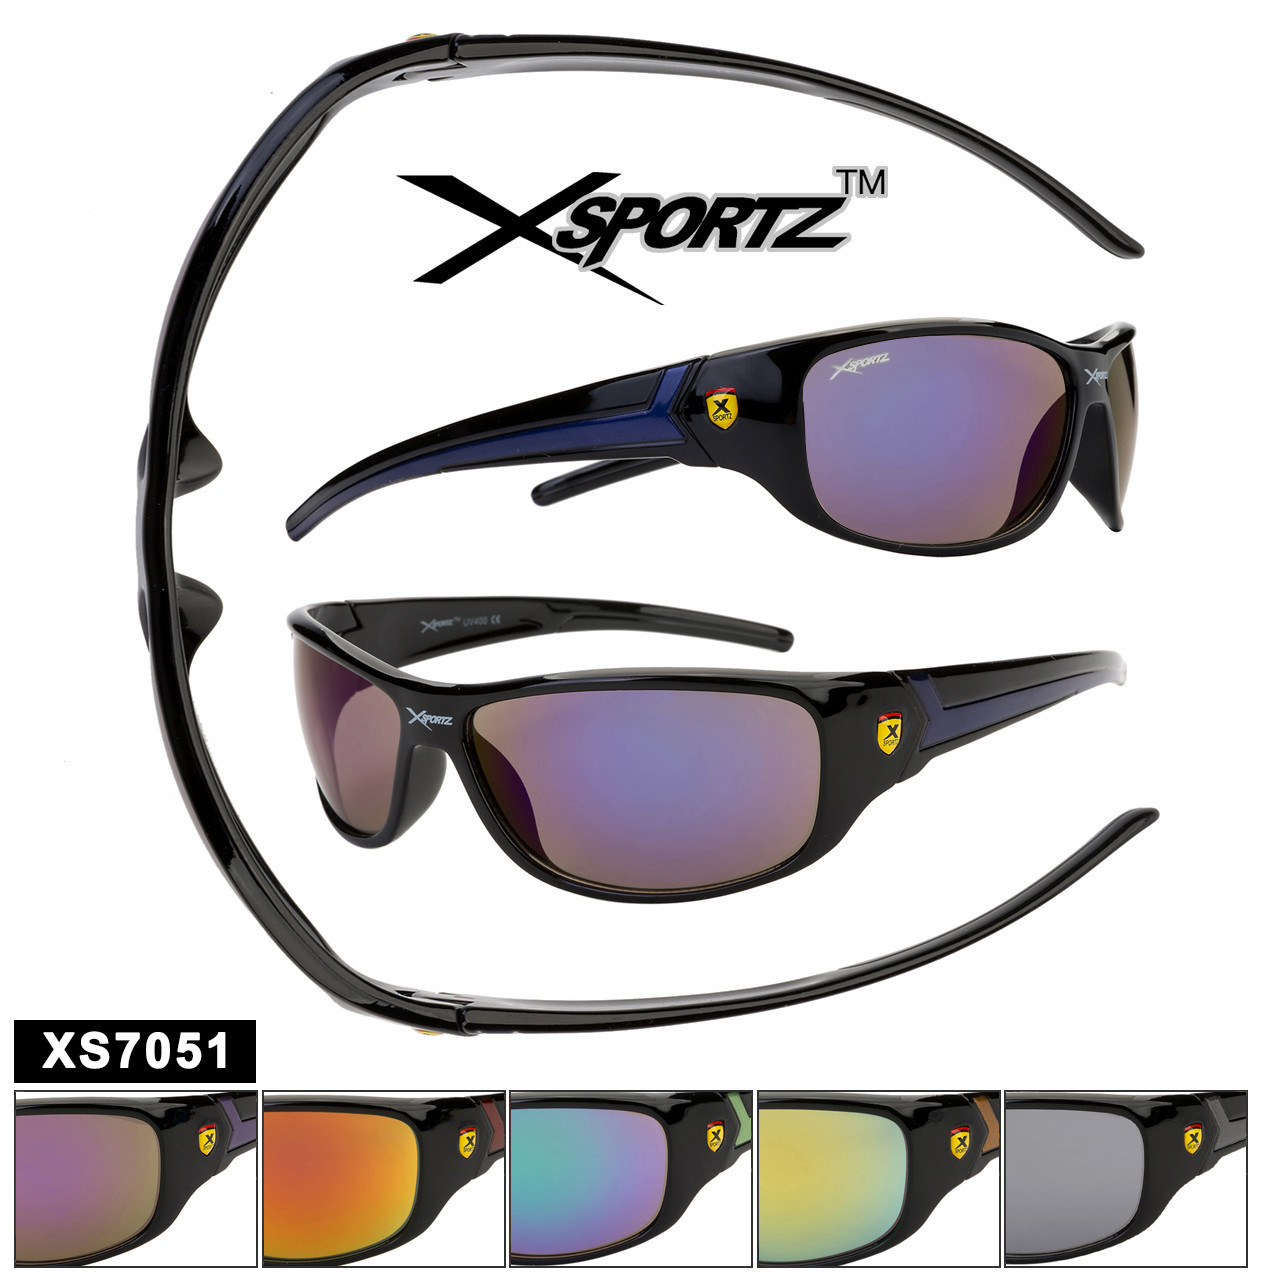 Sports Sunglasses by the Dozen - Style XS7051